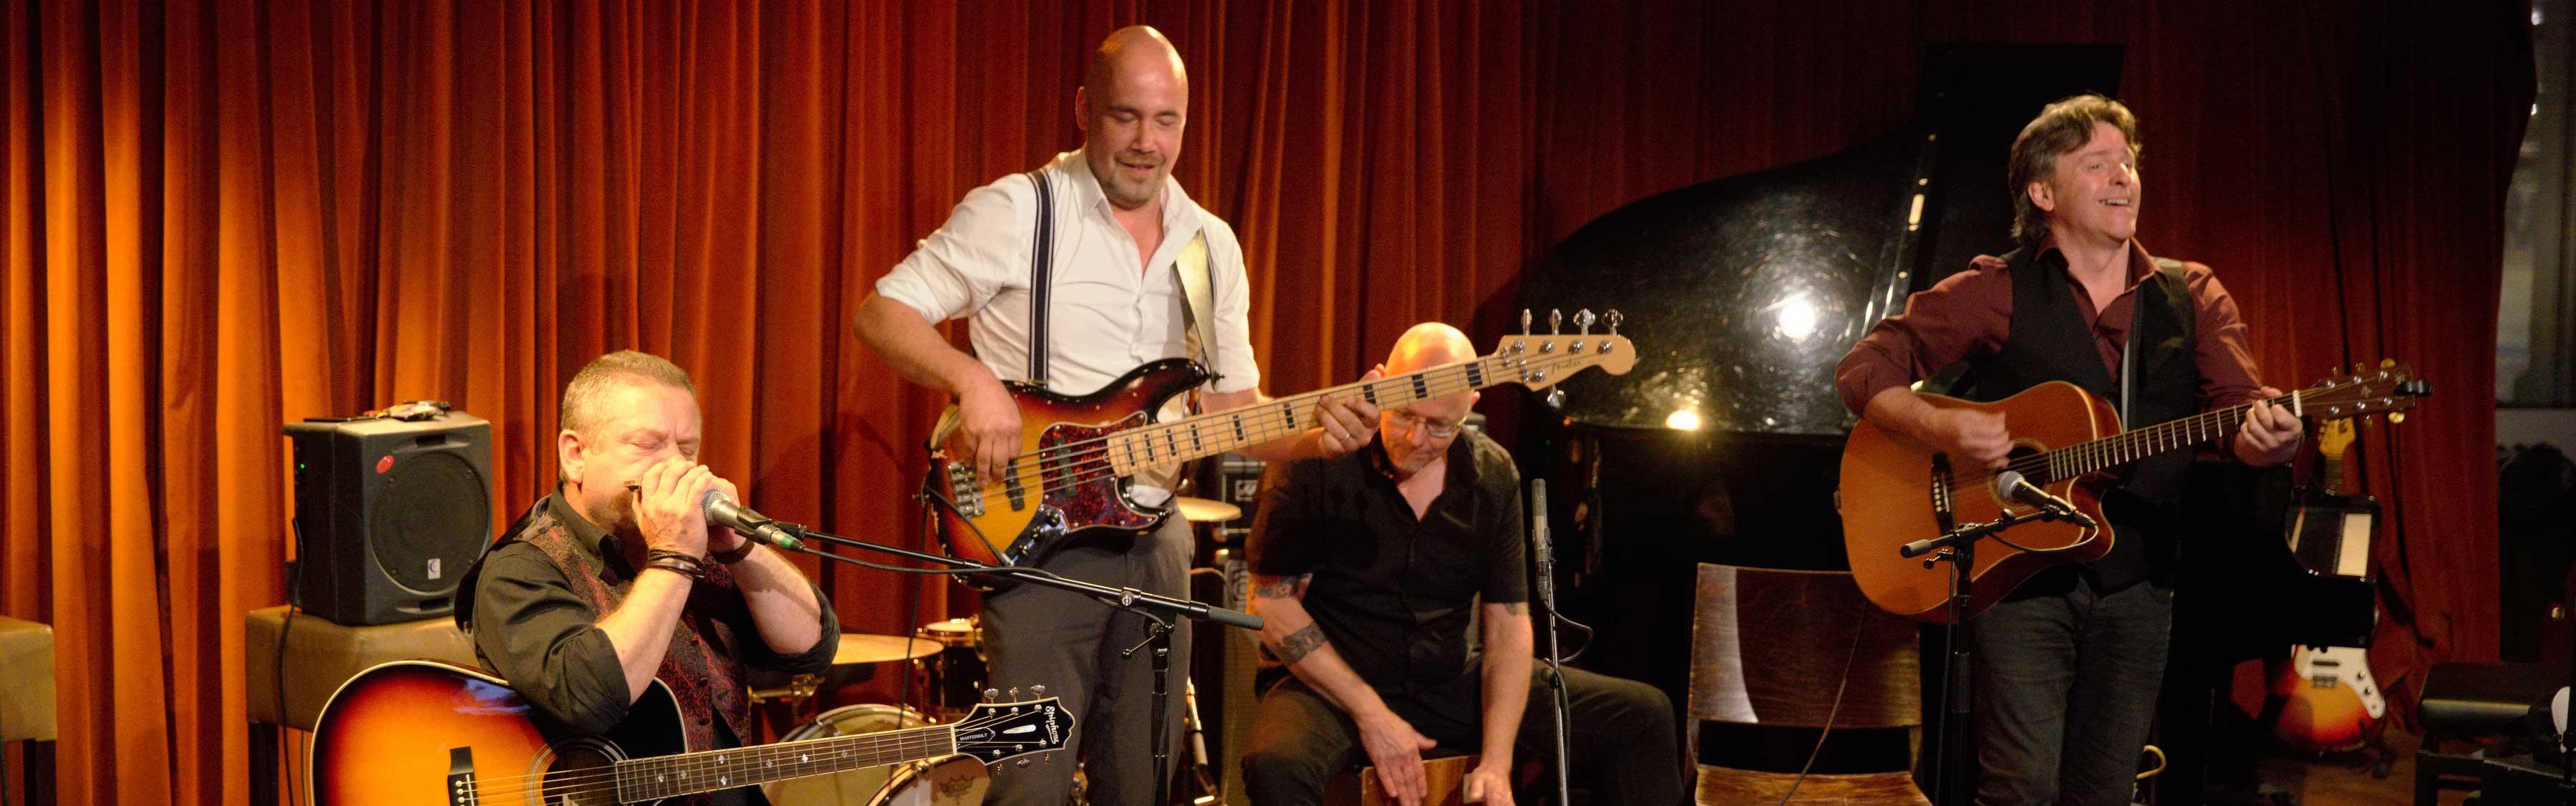 bluesband Ramblin' Dog @SiSo, Grand Café Meneer Frits, Eindhoven. Foto: Ronald Rietman